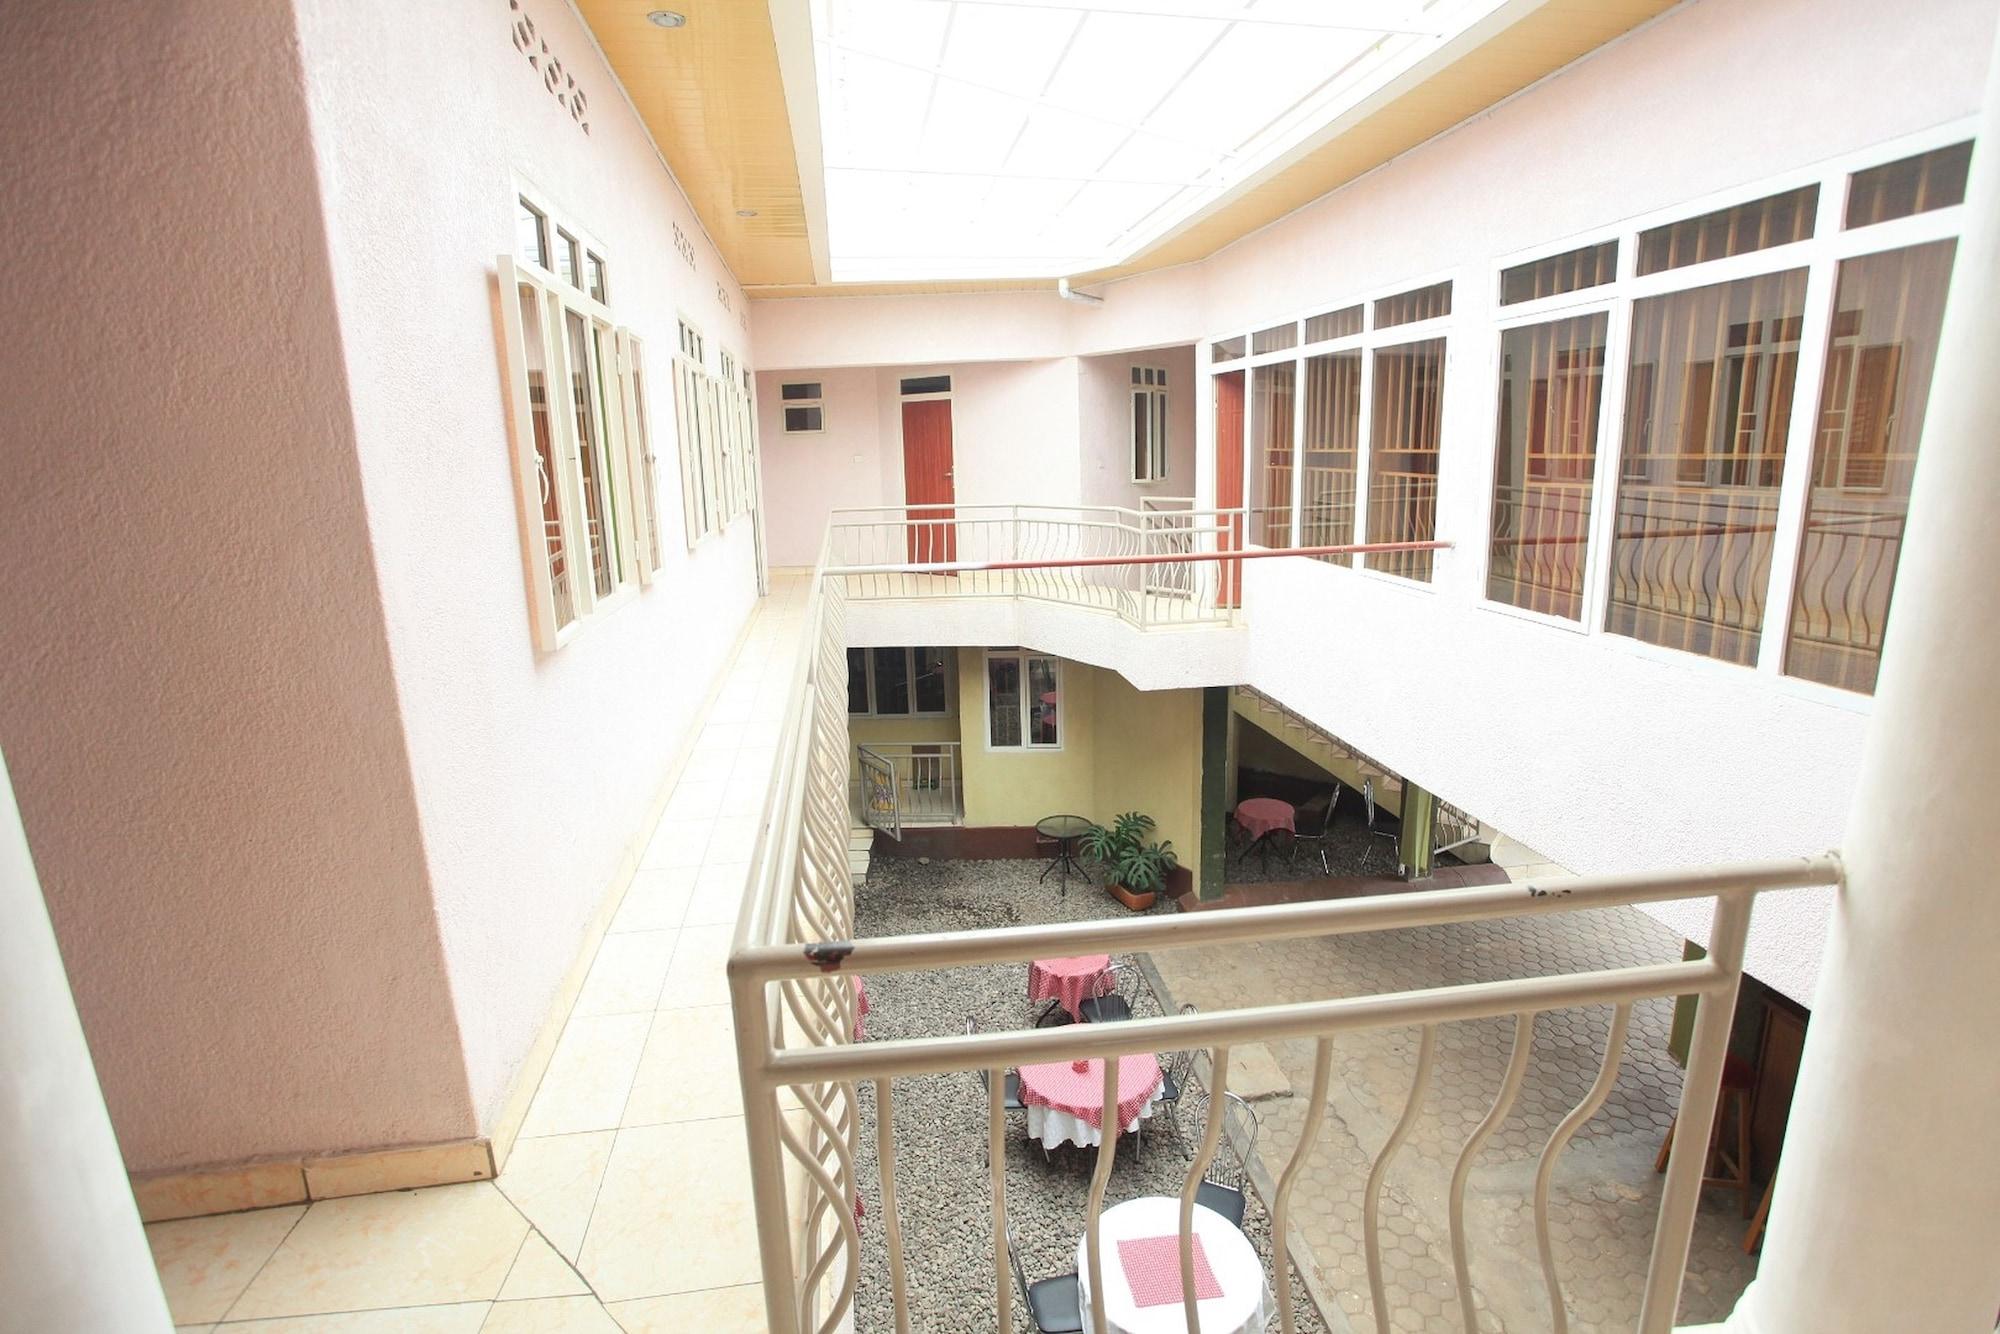 La Voisina Hotel, Musanze